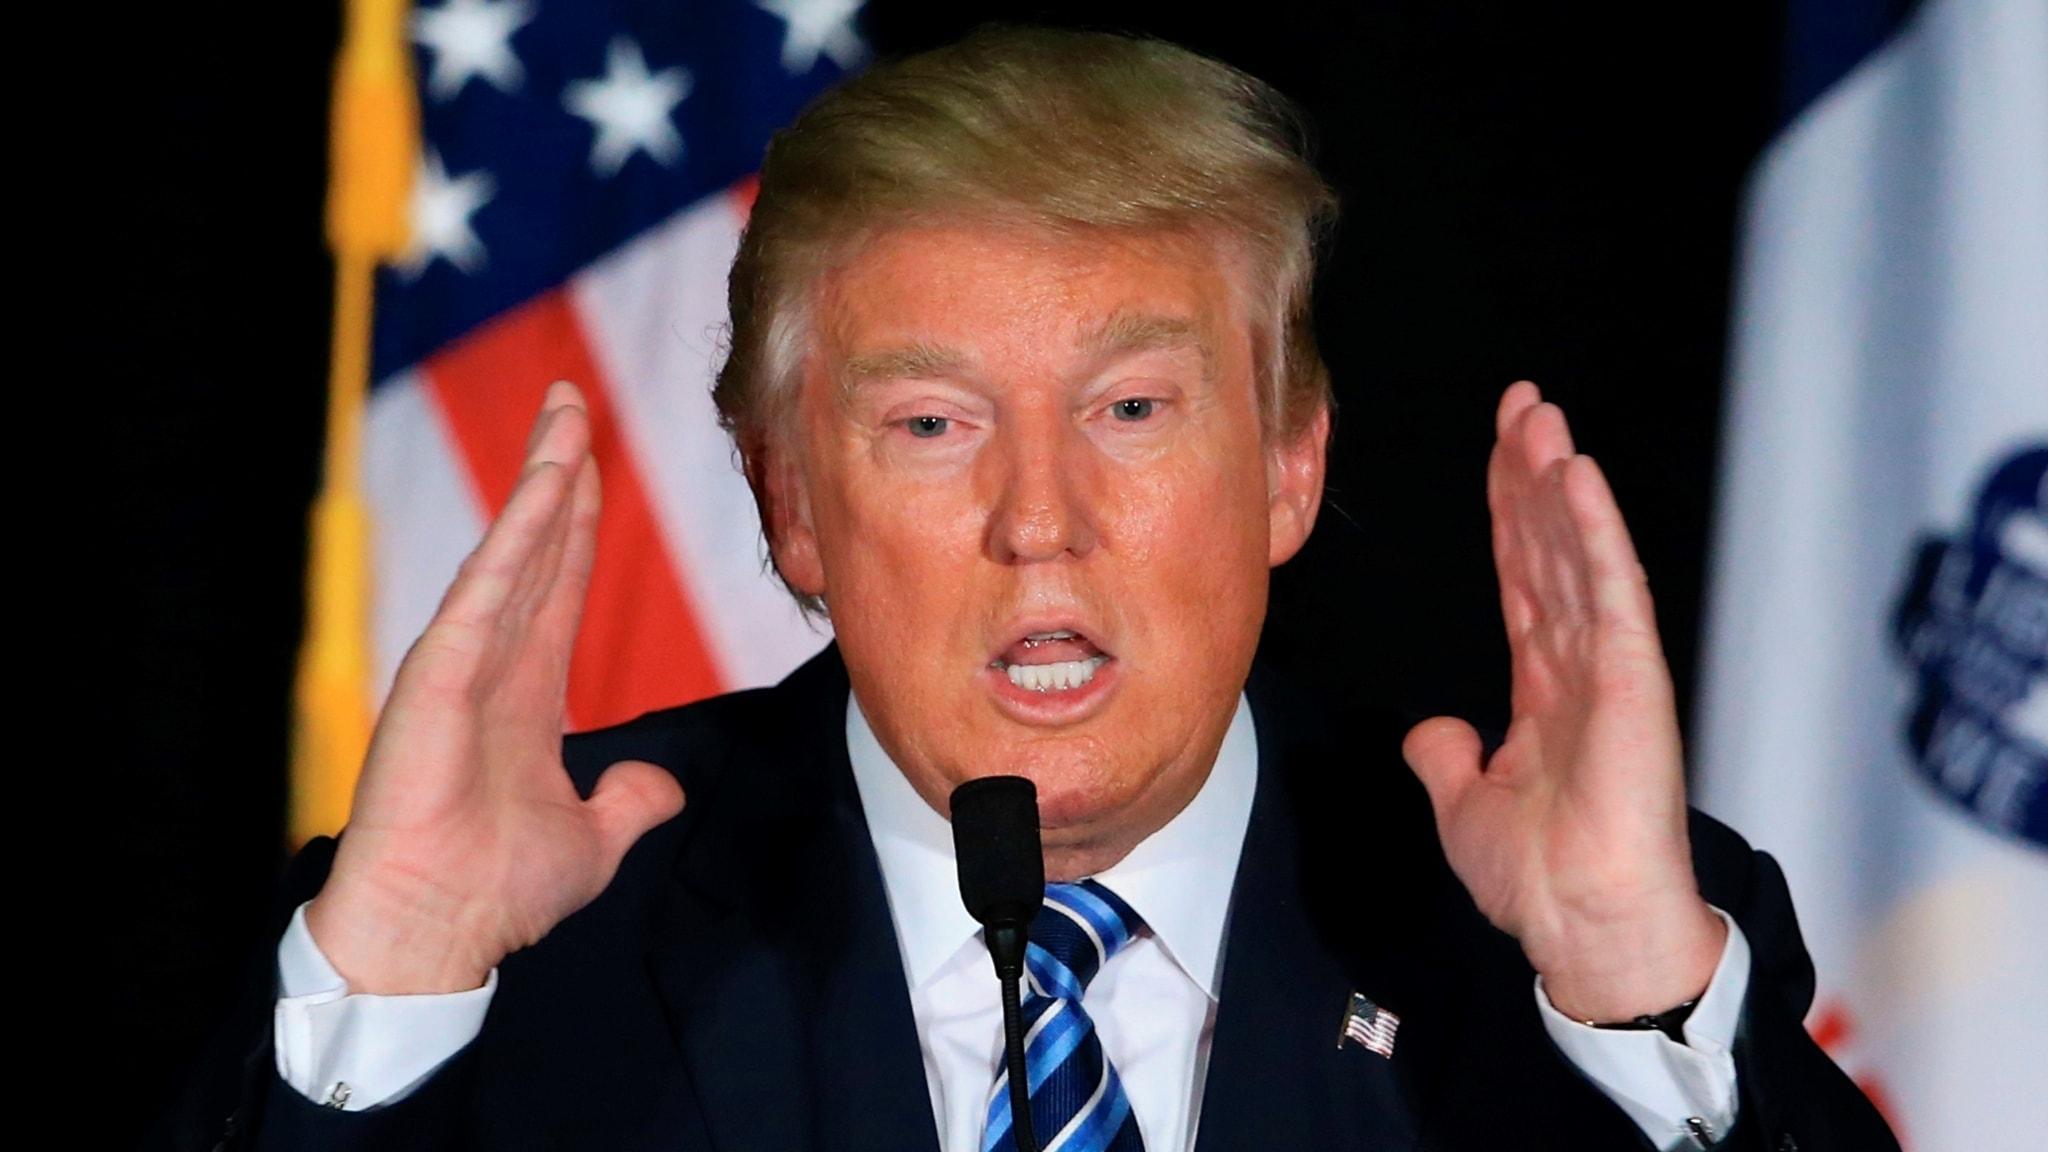 Kan Donald Trump få sparken?